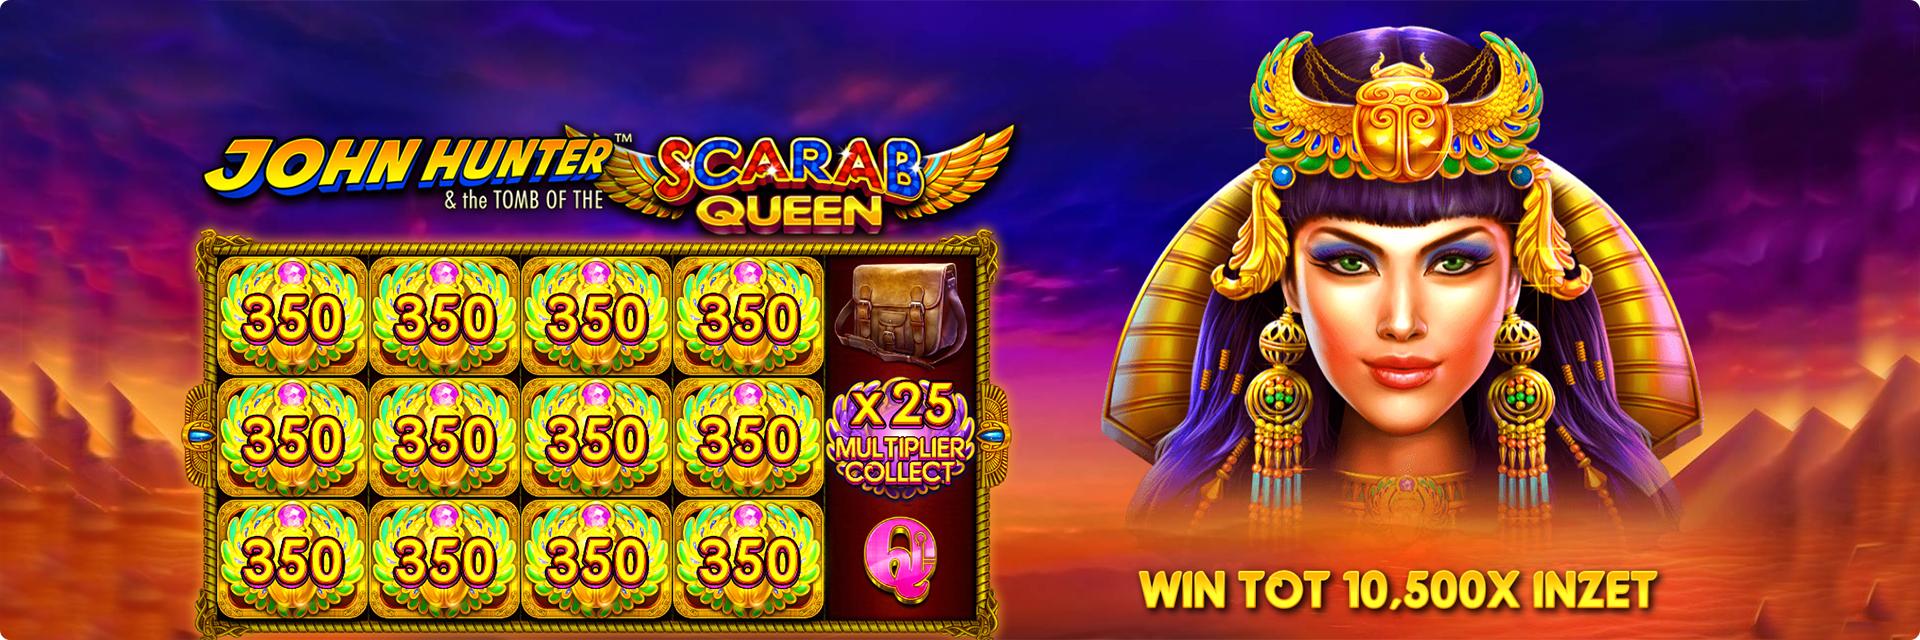 John Hunter Scarab Queen slot machine.